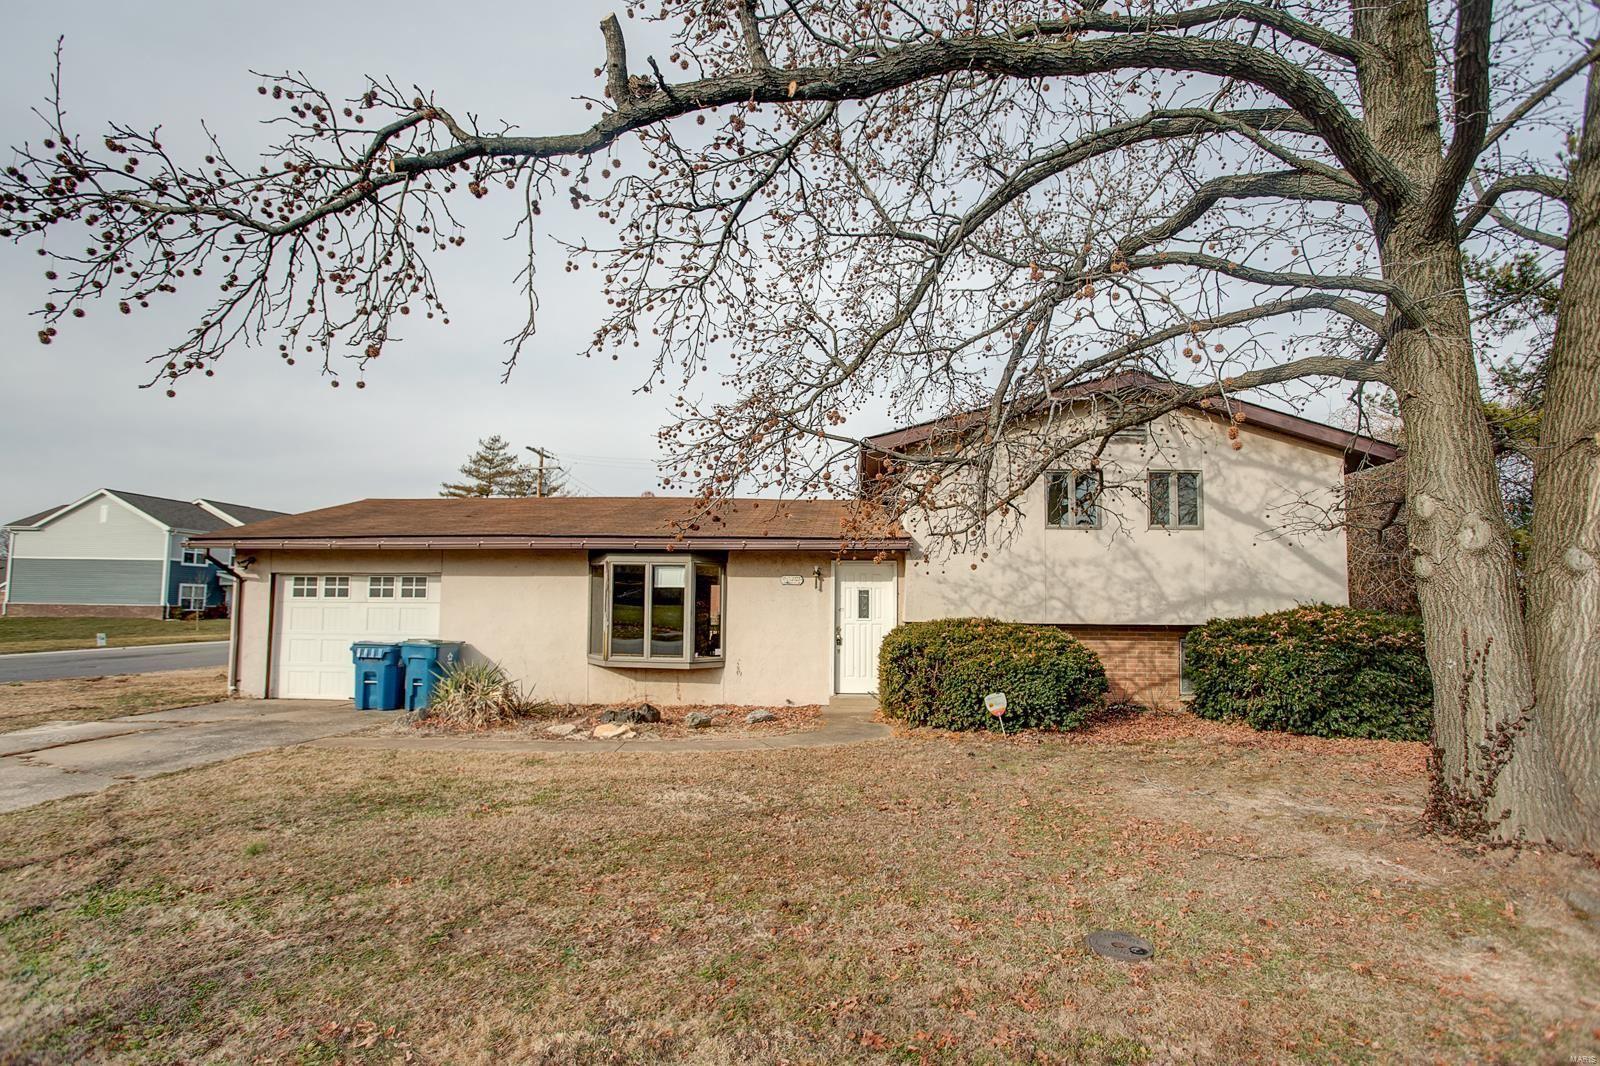 1715 Olive, Collinsville, IL 62234 - MLS#: 20031326